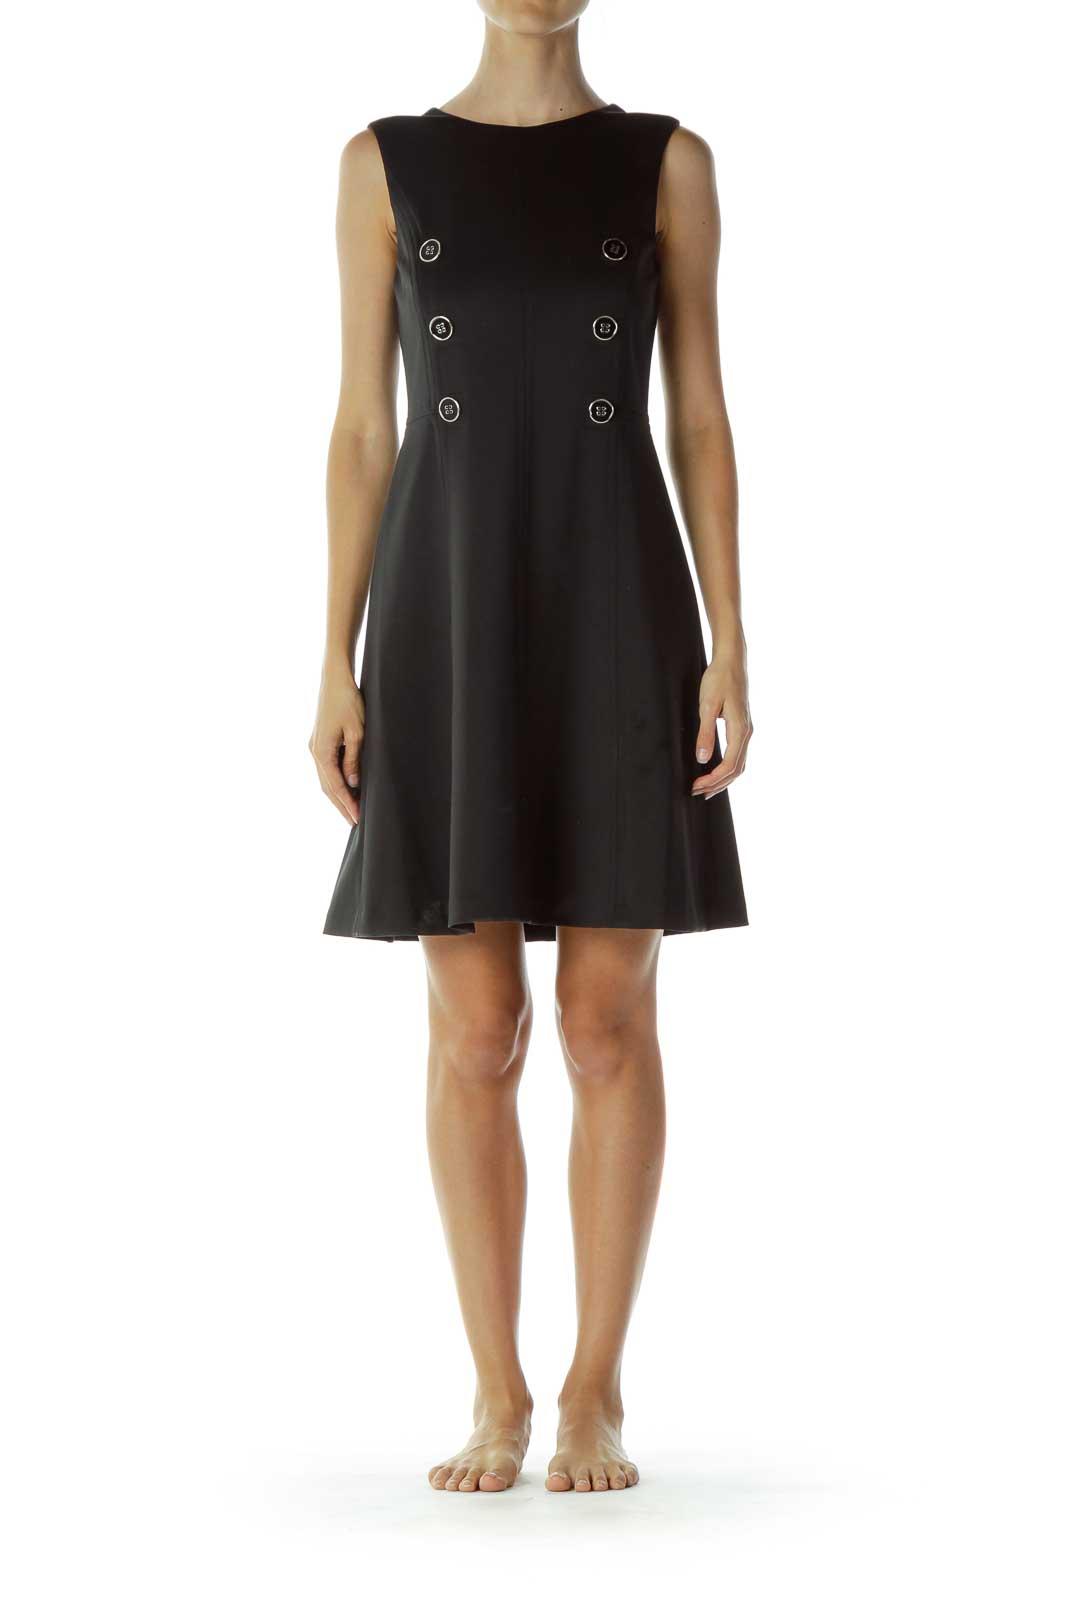 Black Structured A-Line Dress